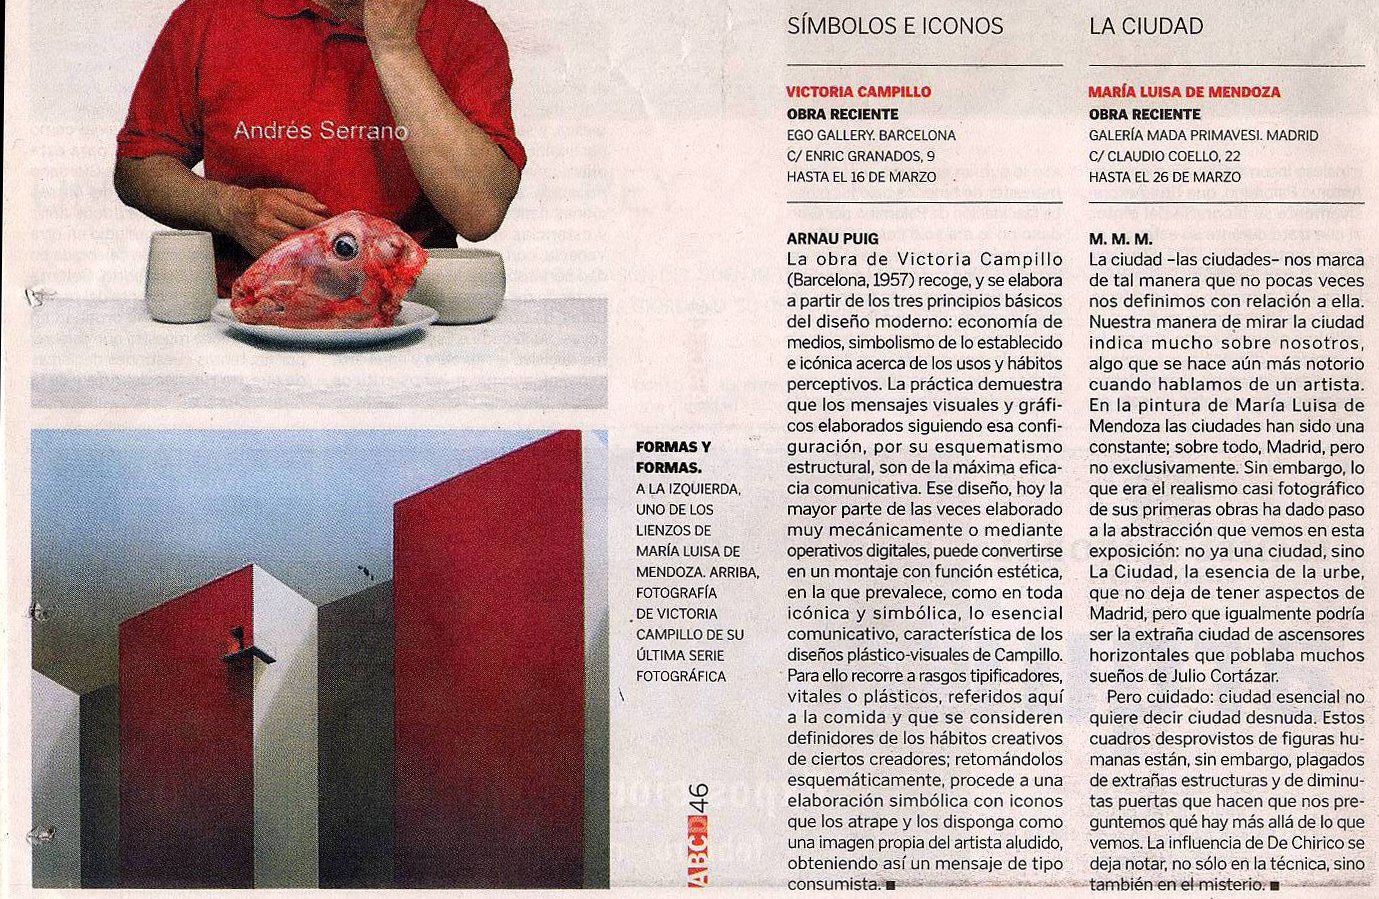 Noticia ABC sobre exposición de pintura en Mada Primavesi